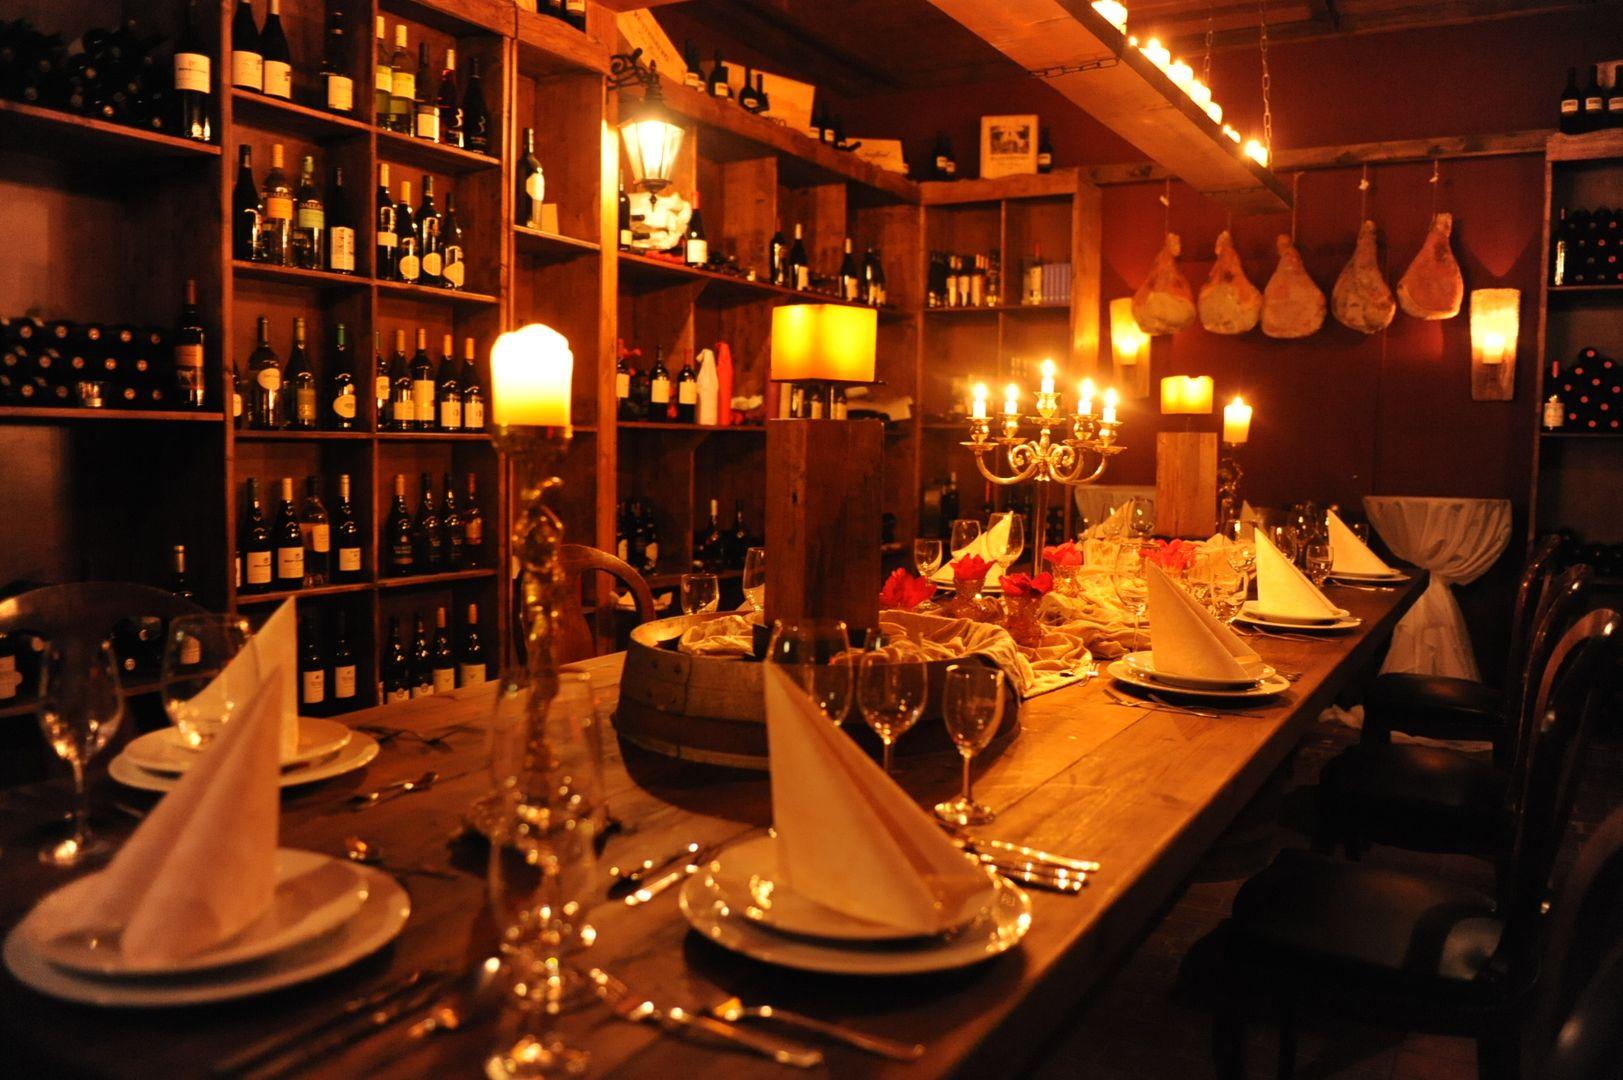 Silvester Dinner Im Restaurants Xii Apostel